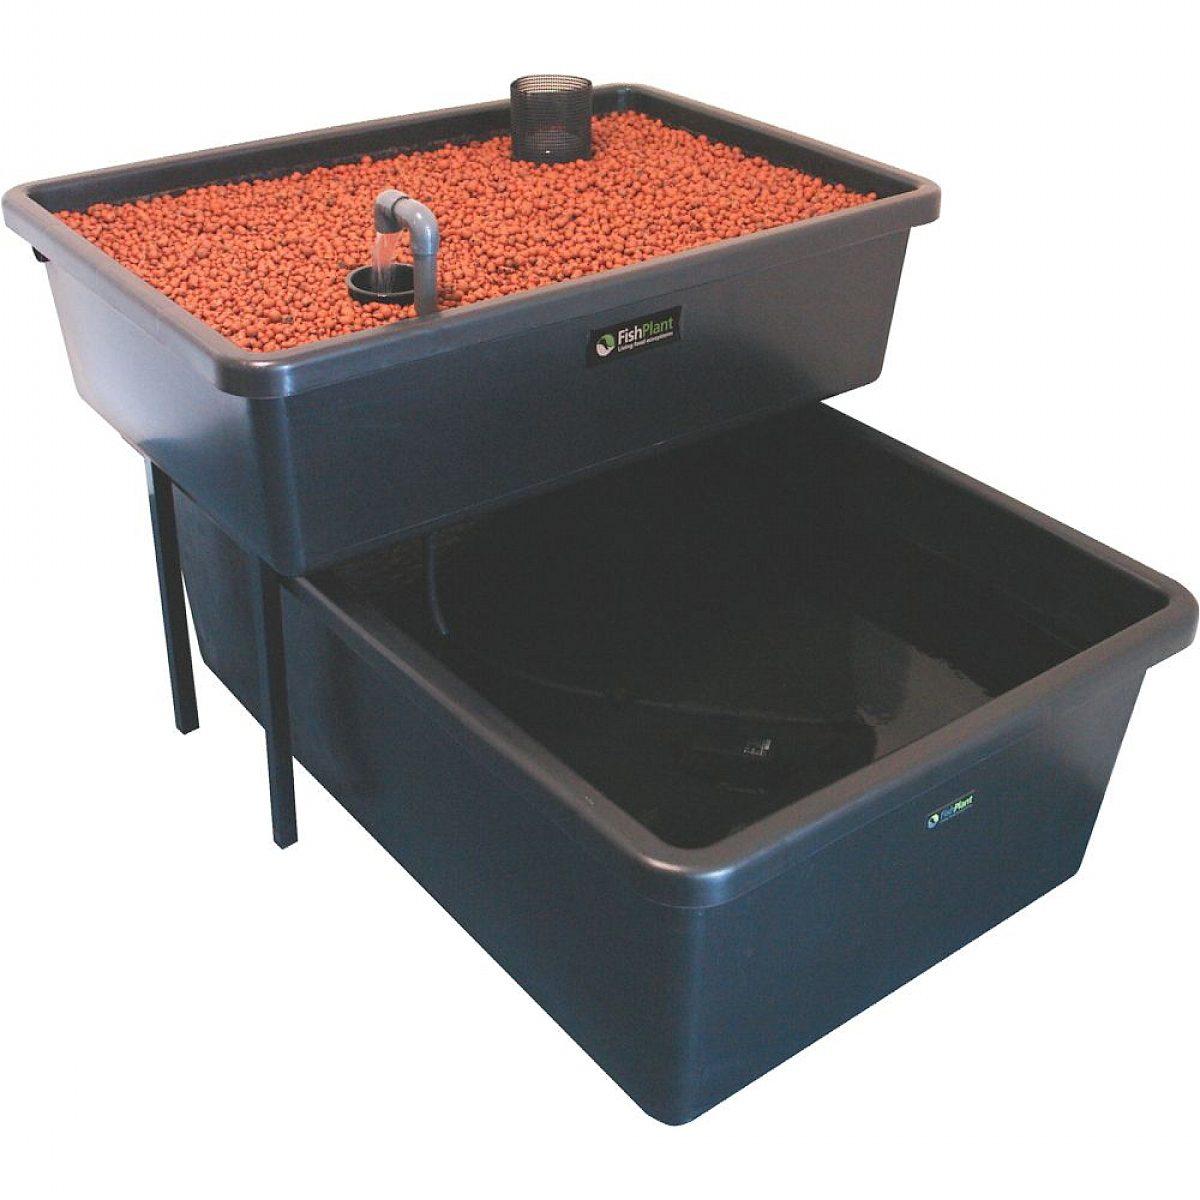 FishPlant Family Aquaponic Unit